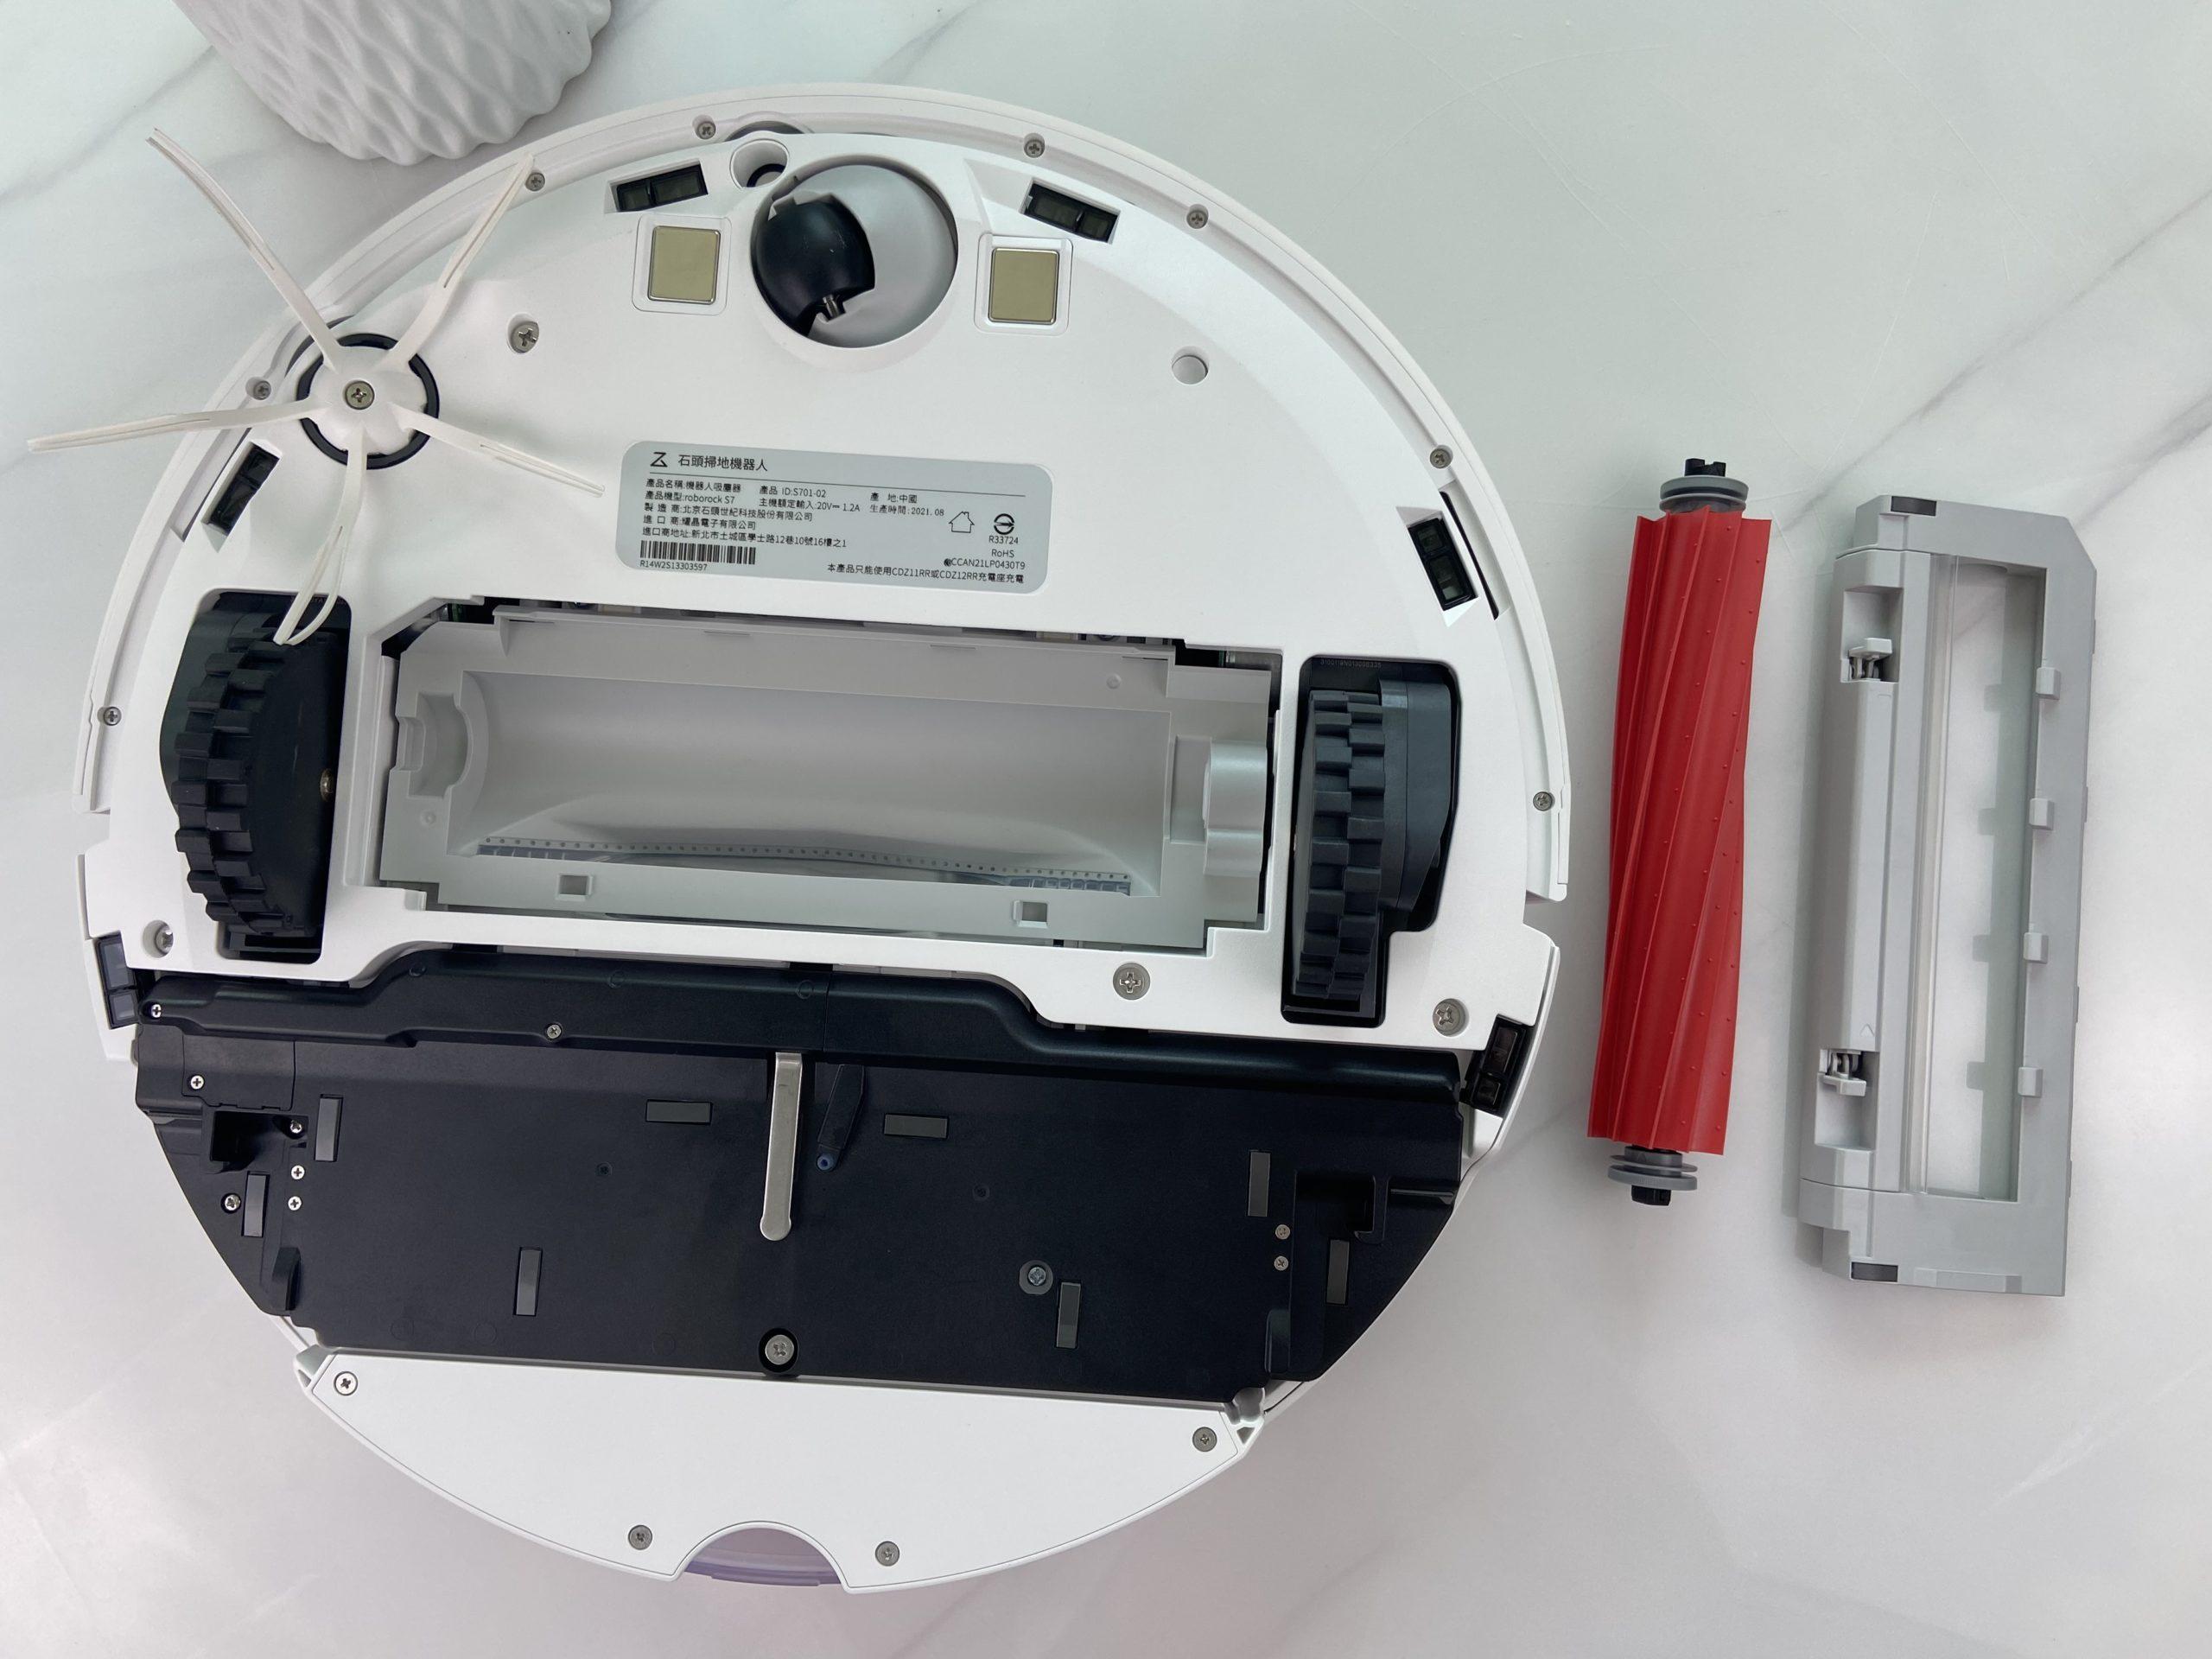 Roborock S7 石頭掃拖機器人 底部構造 圖2